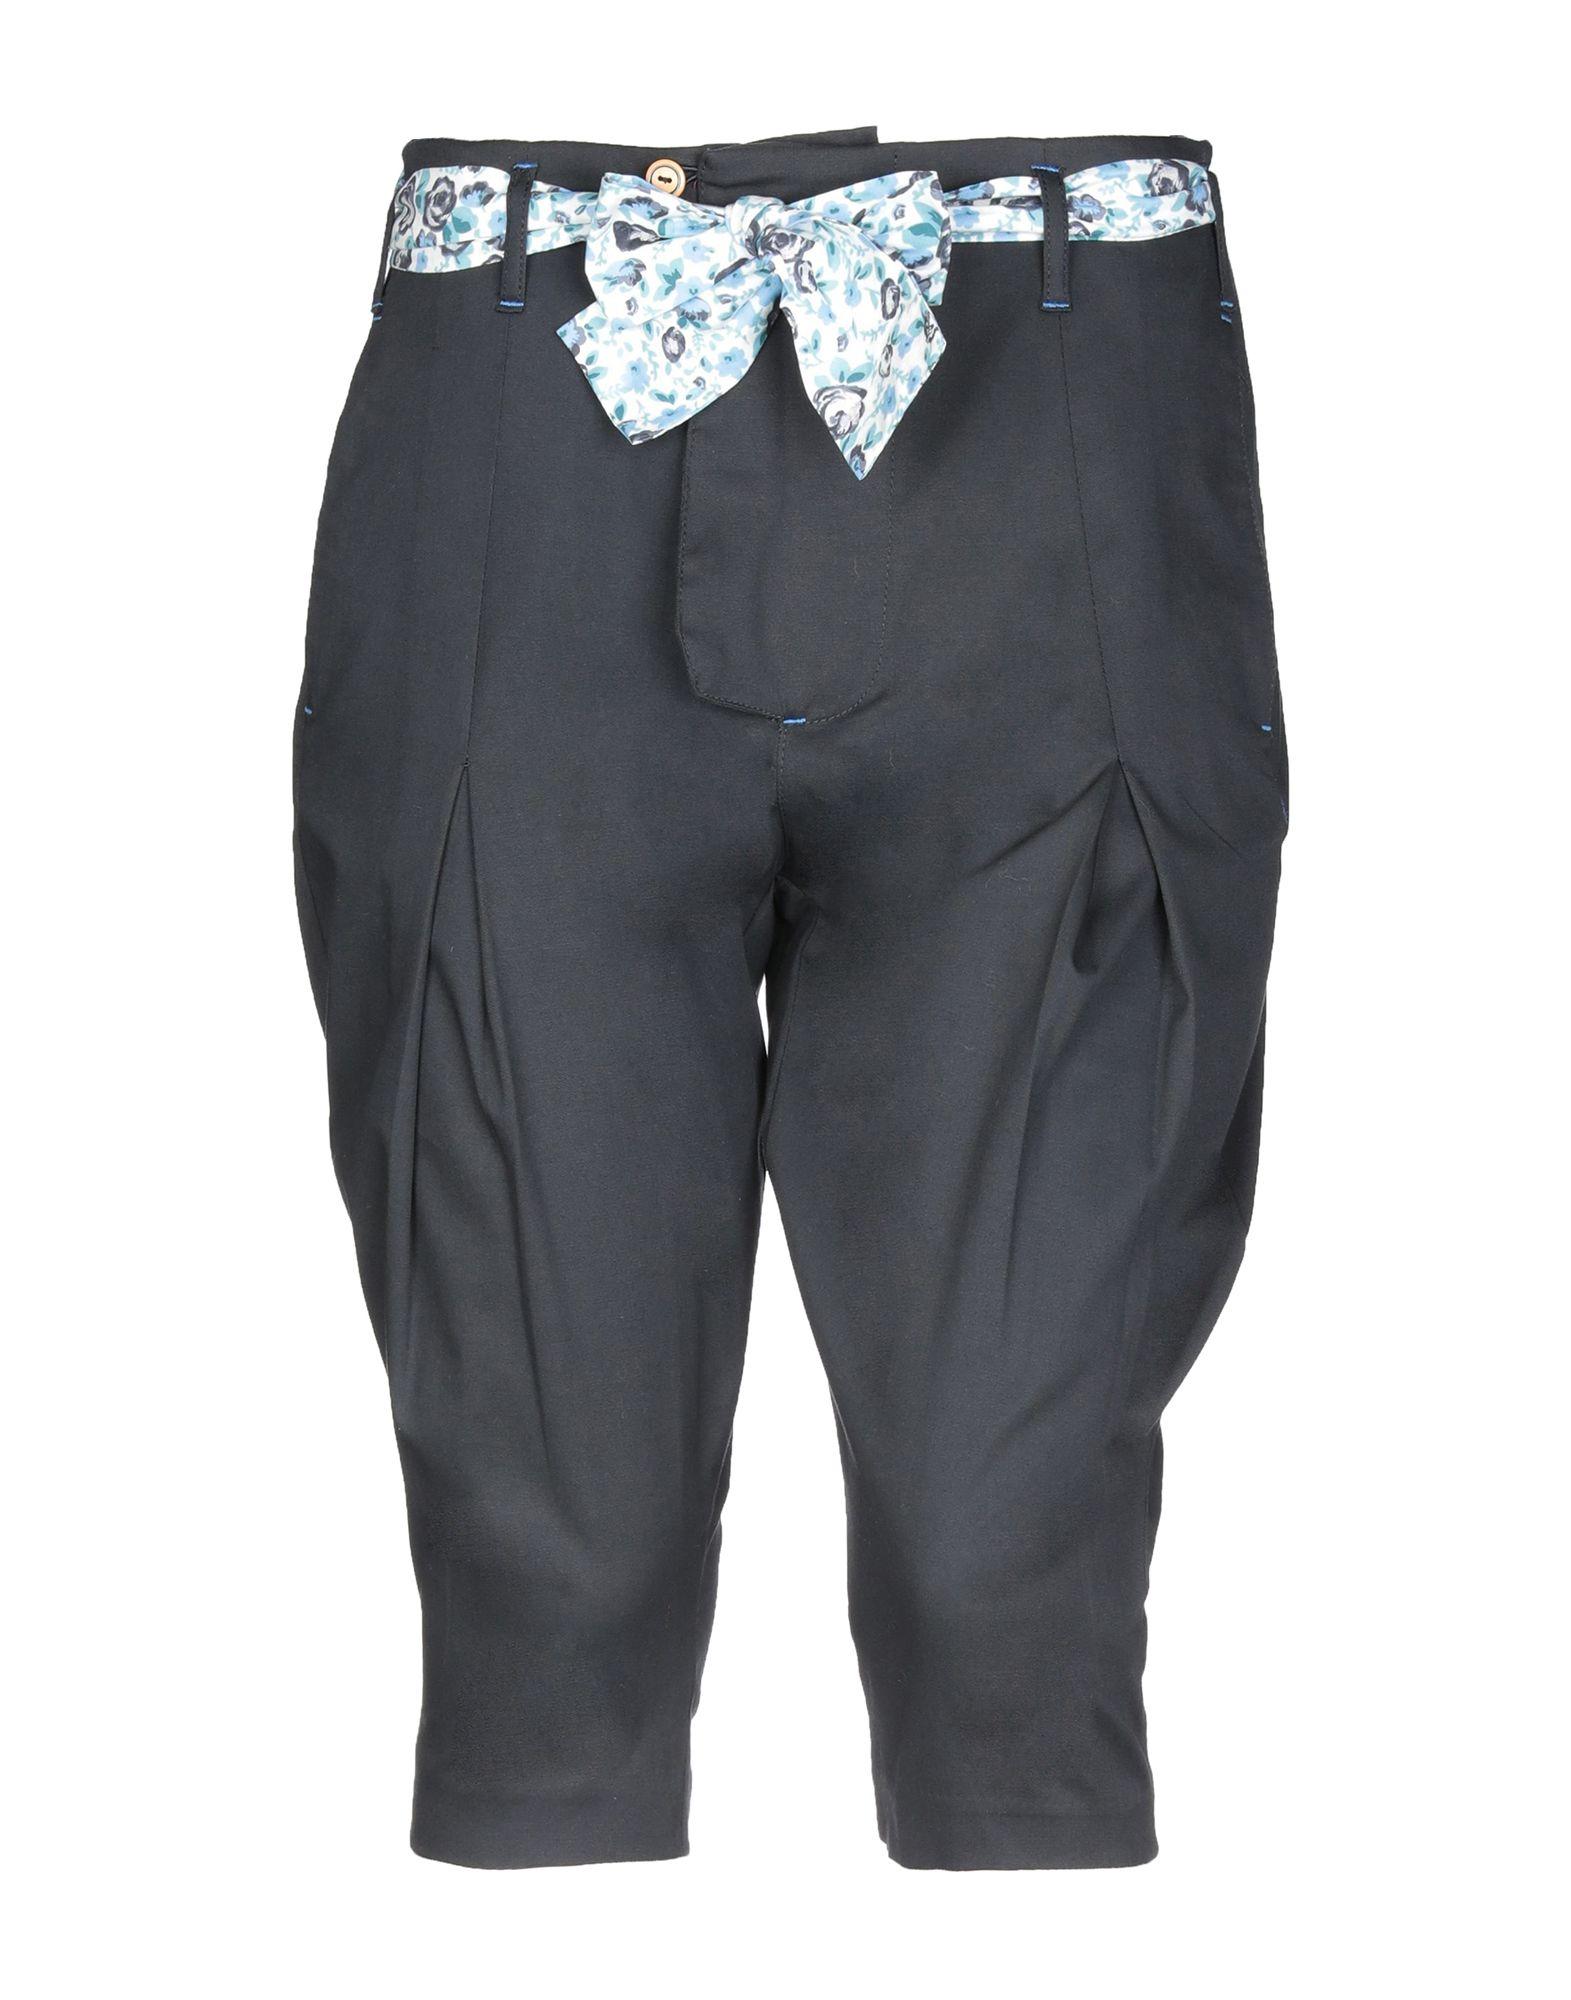 NEILL KATTER Брюки-капри rary брюки капри